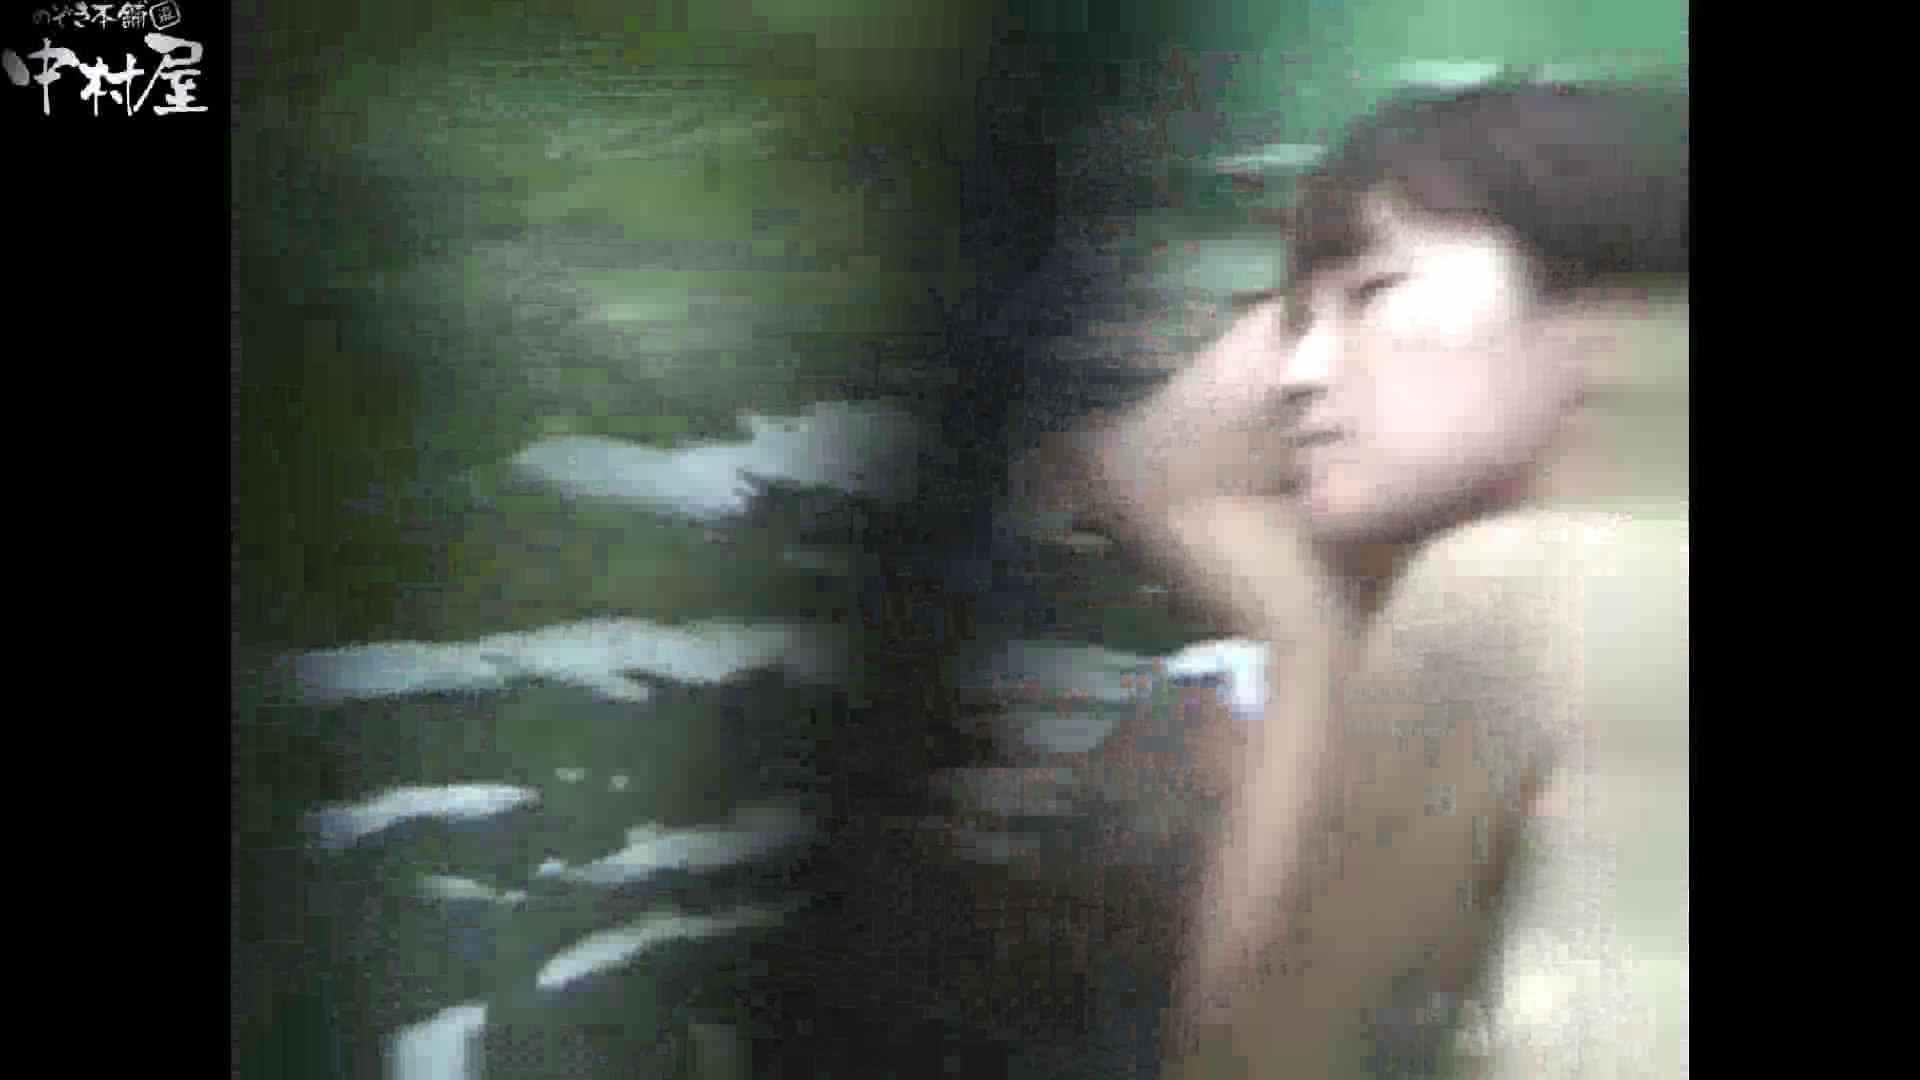 Aquaな露天風呂Vol.867潜入盗撮露天風呂参判湯 其の一 潜入突撃 エロ画像 99pic 83